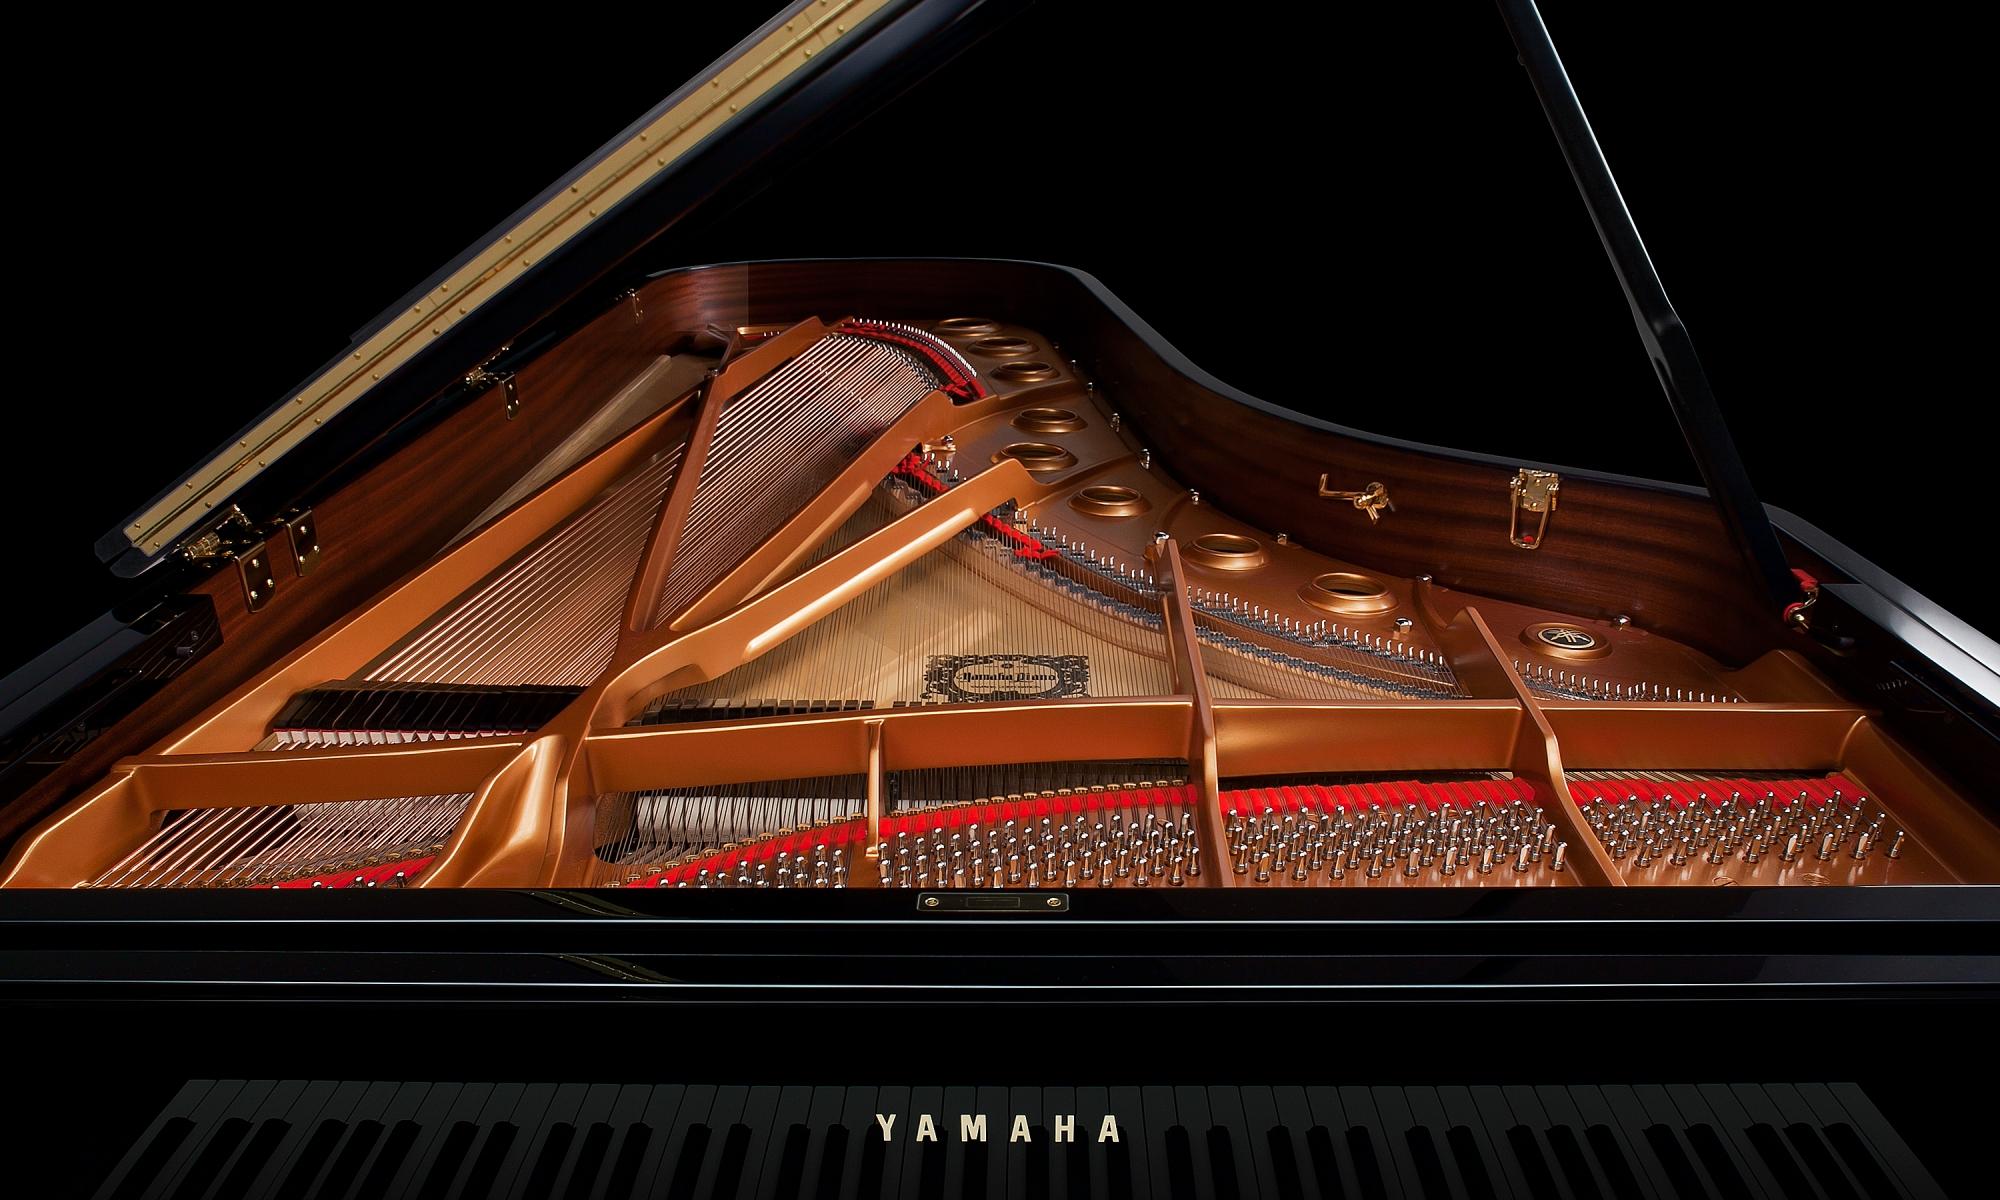 Cfx yamaha design yamaha corporation for Yamaha piano los angeles